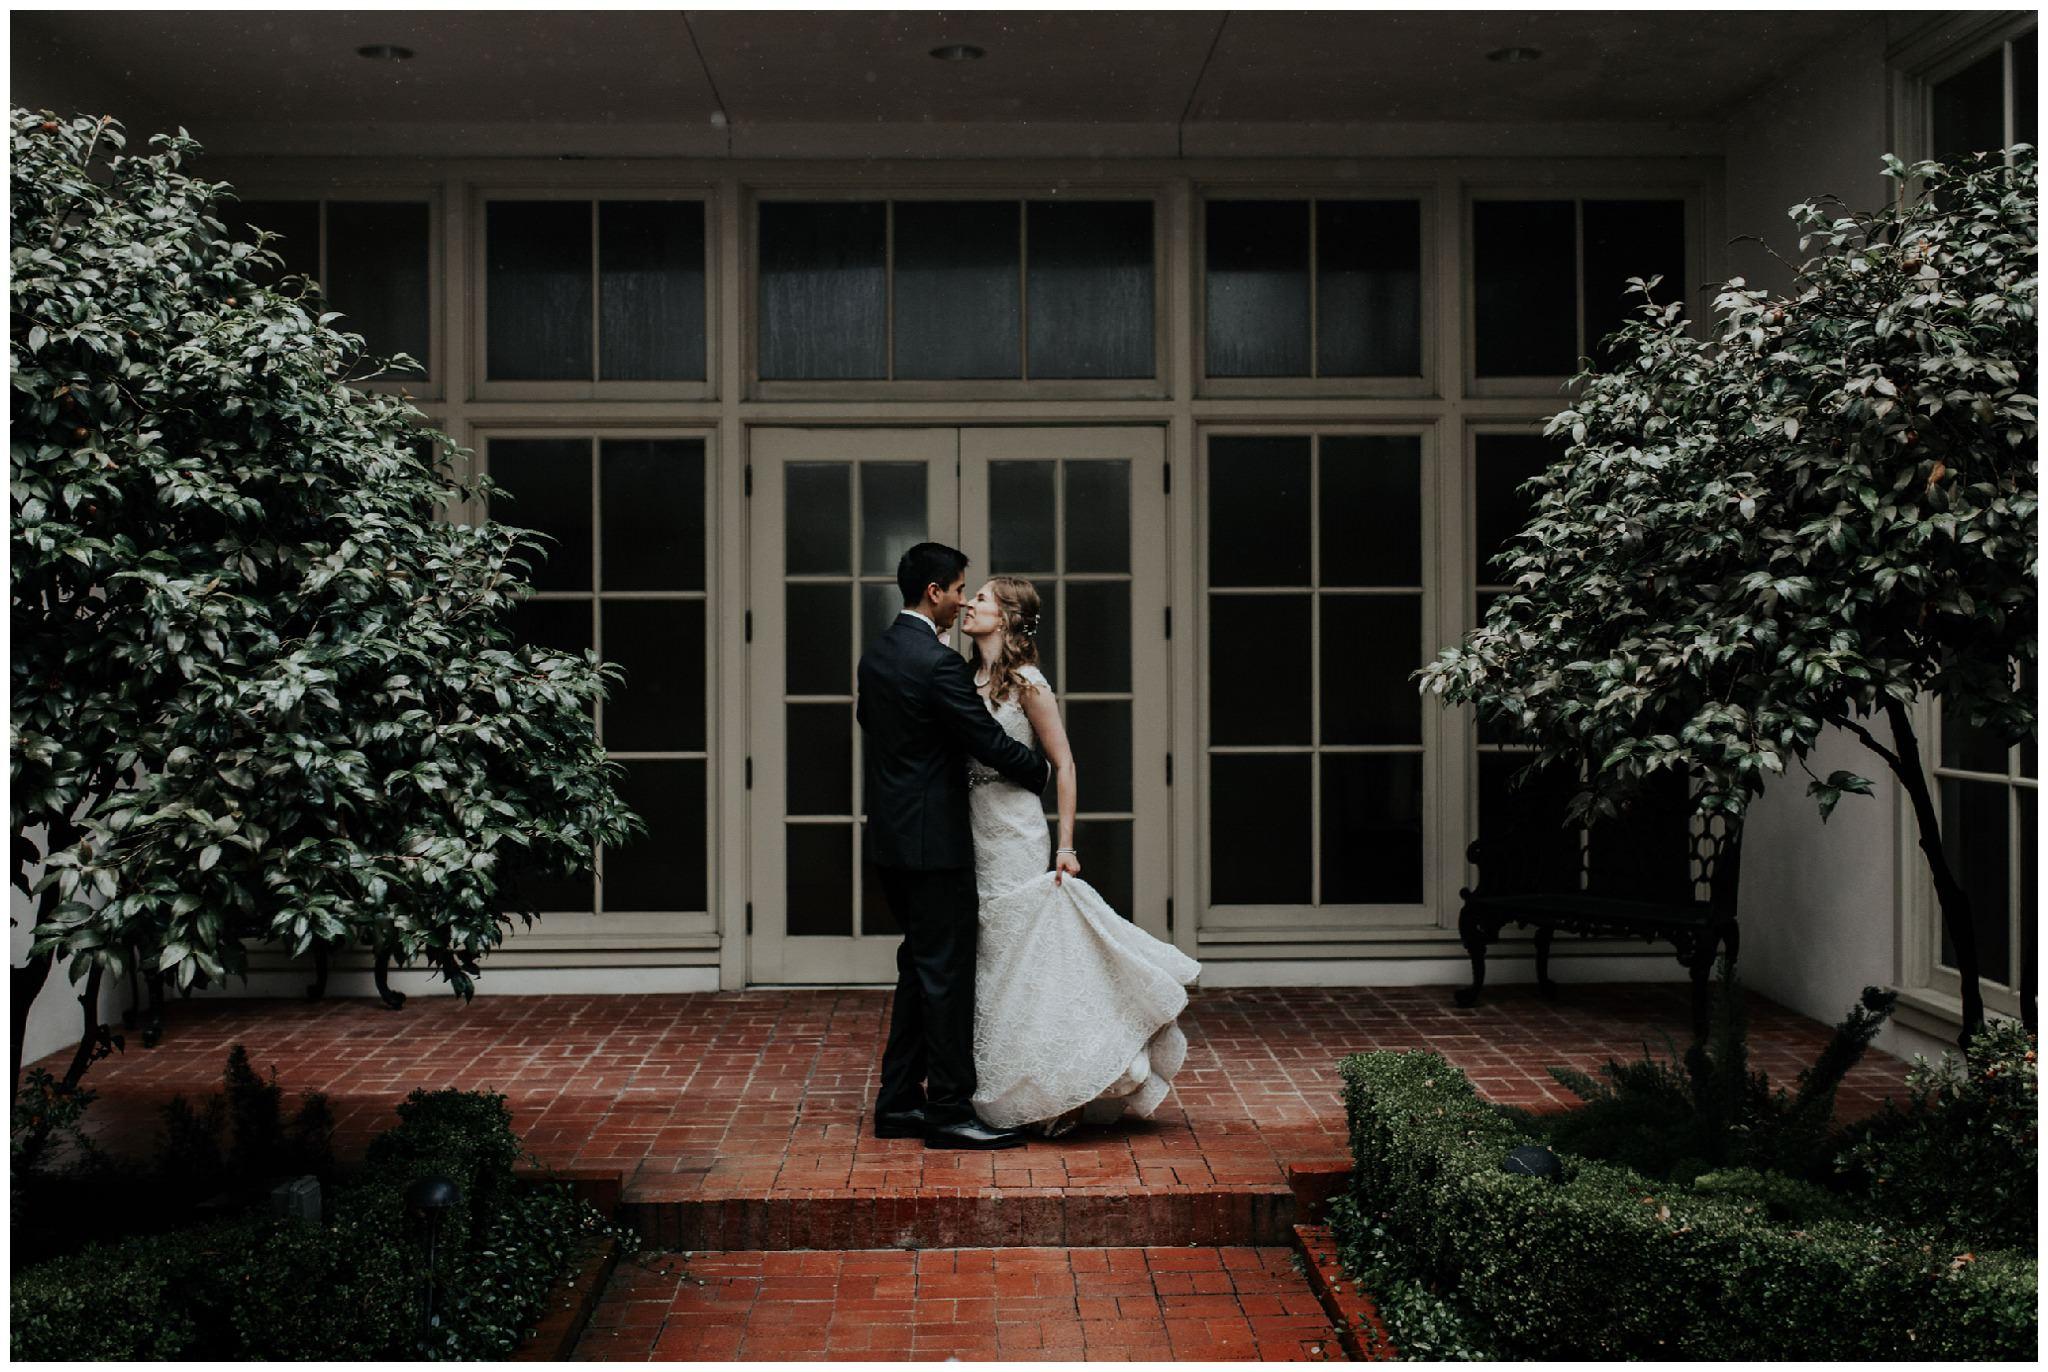 Wedding at the Junior League Houston Texas  - Madeleine Frost-2183.jpg